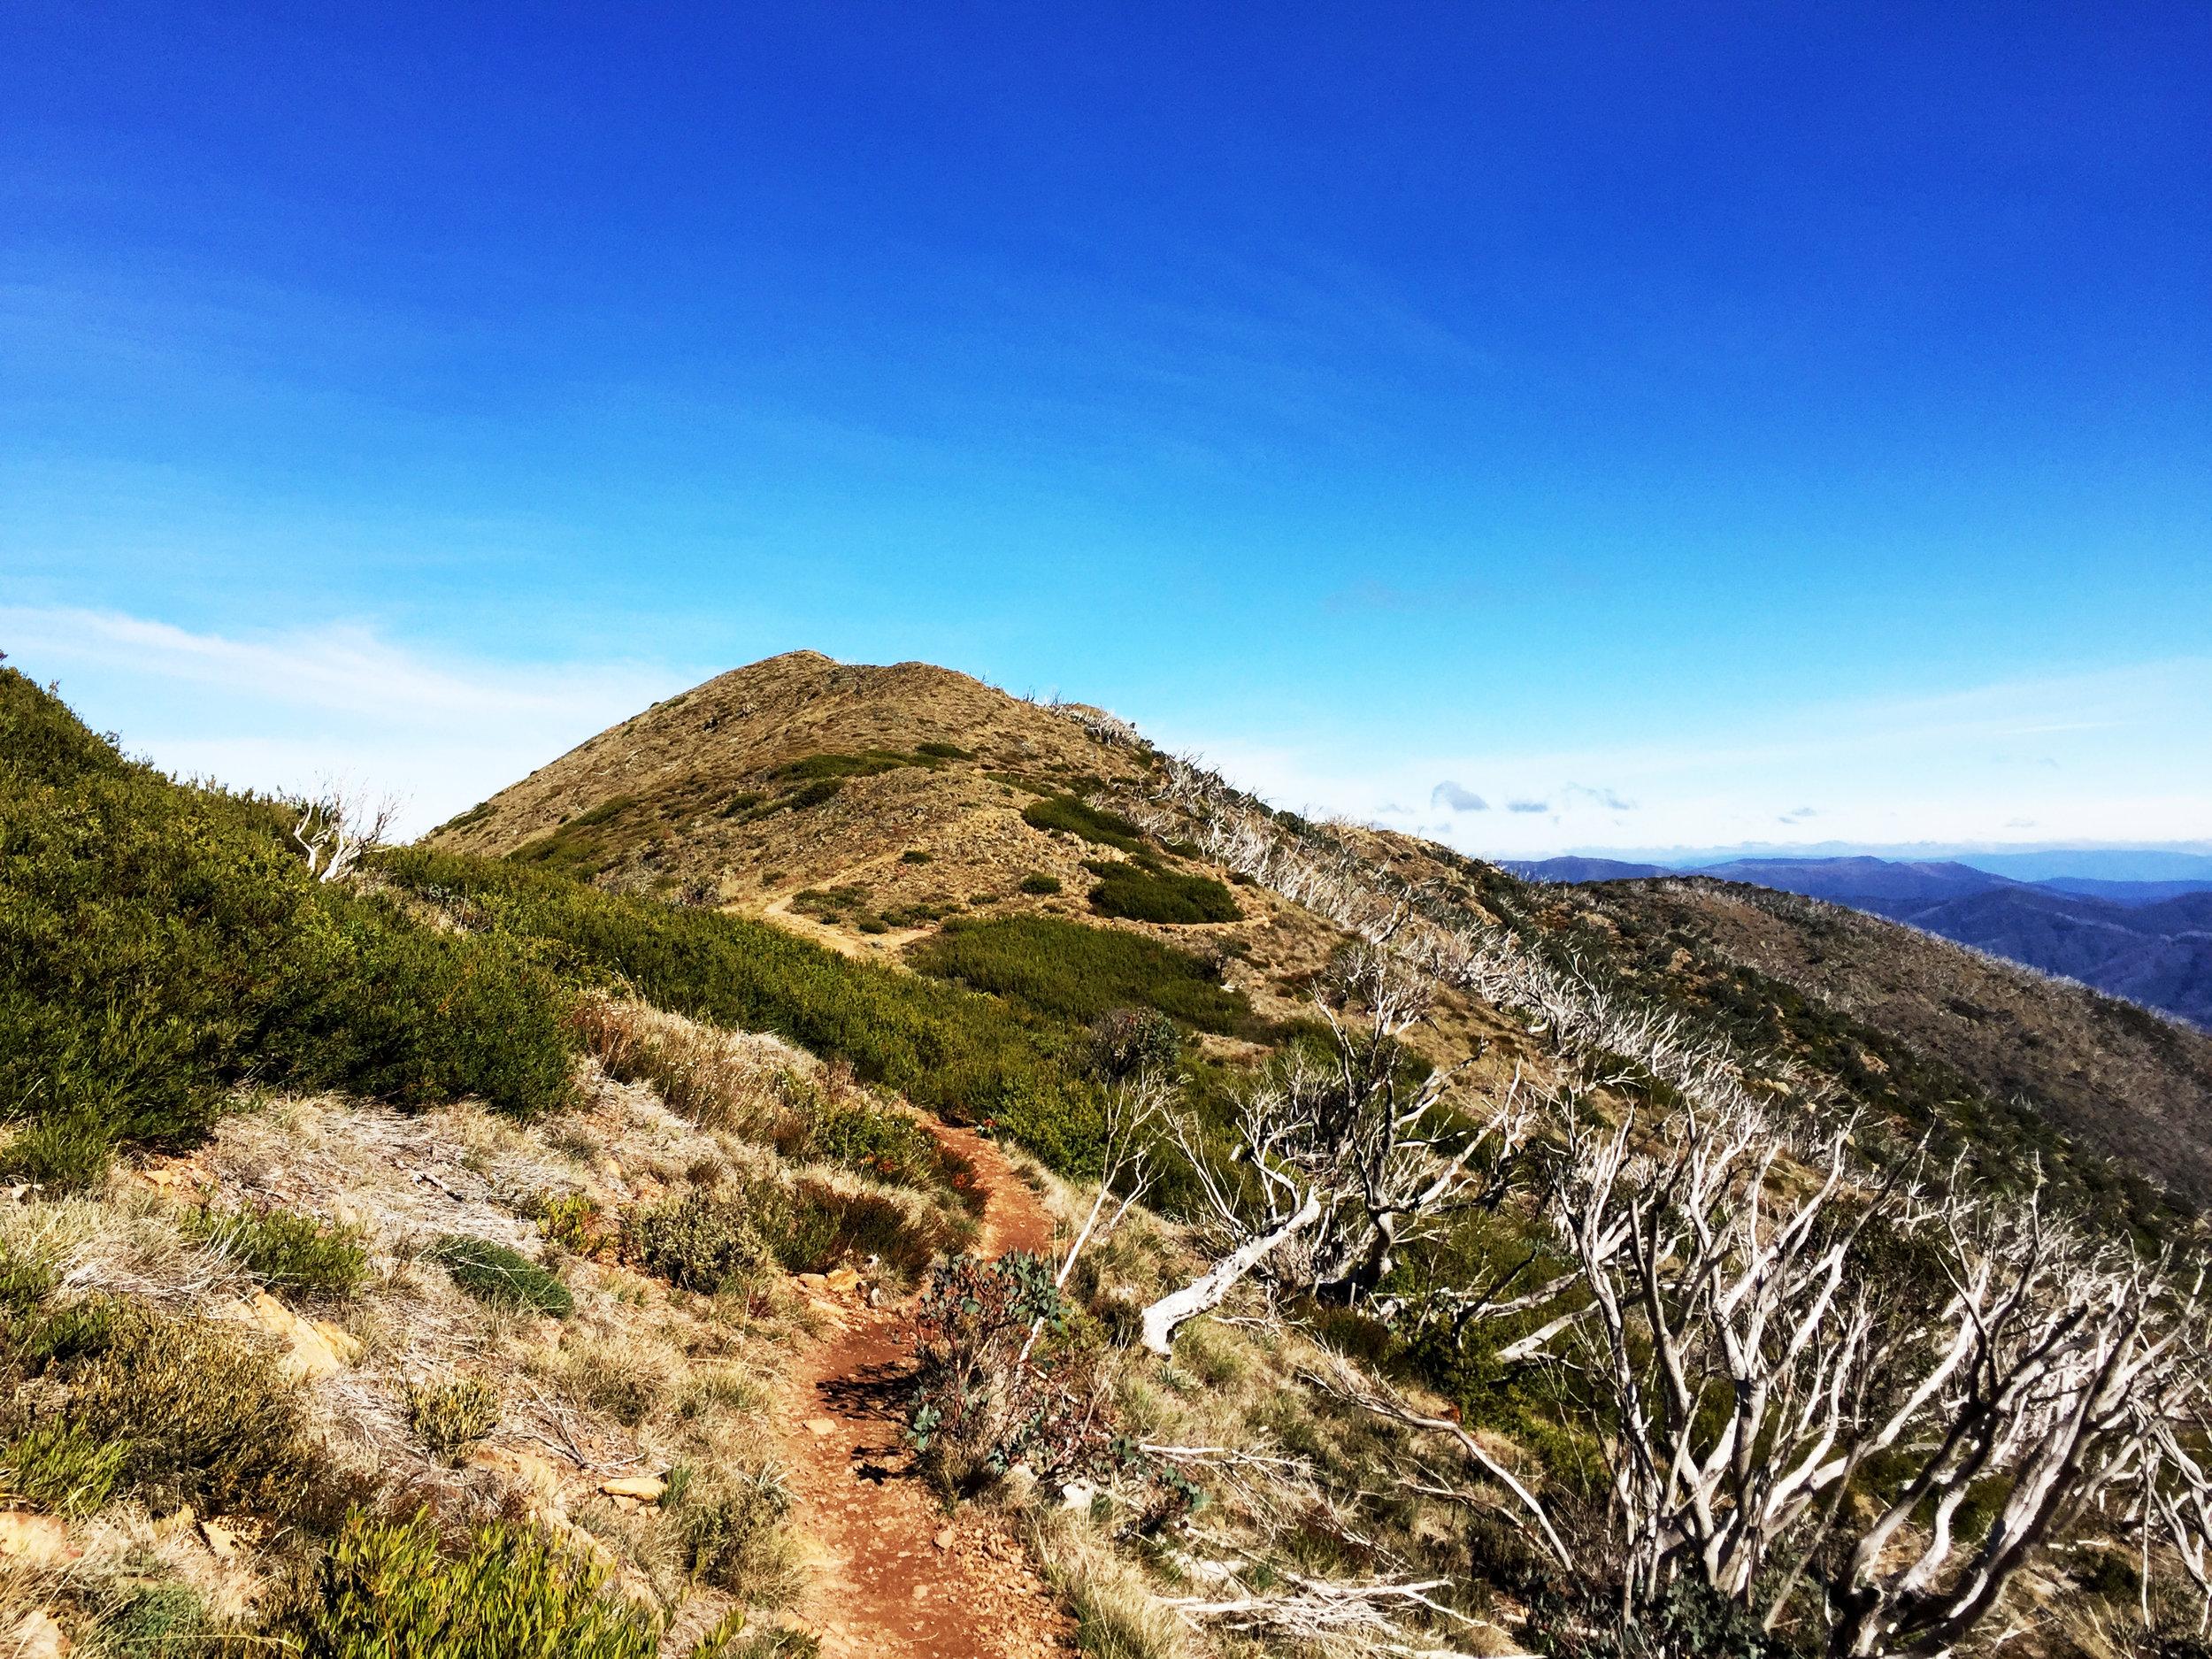 The trail along The Razorback